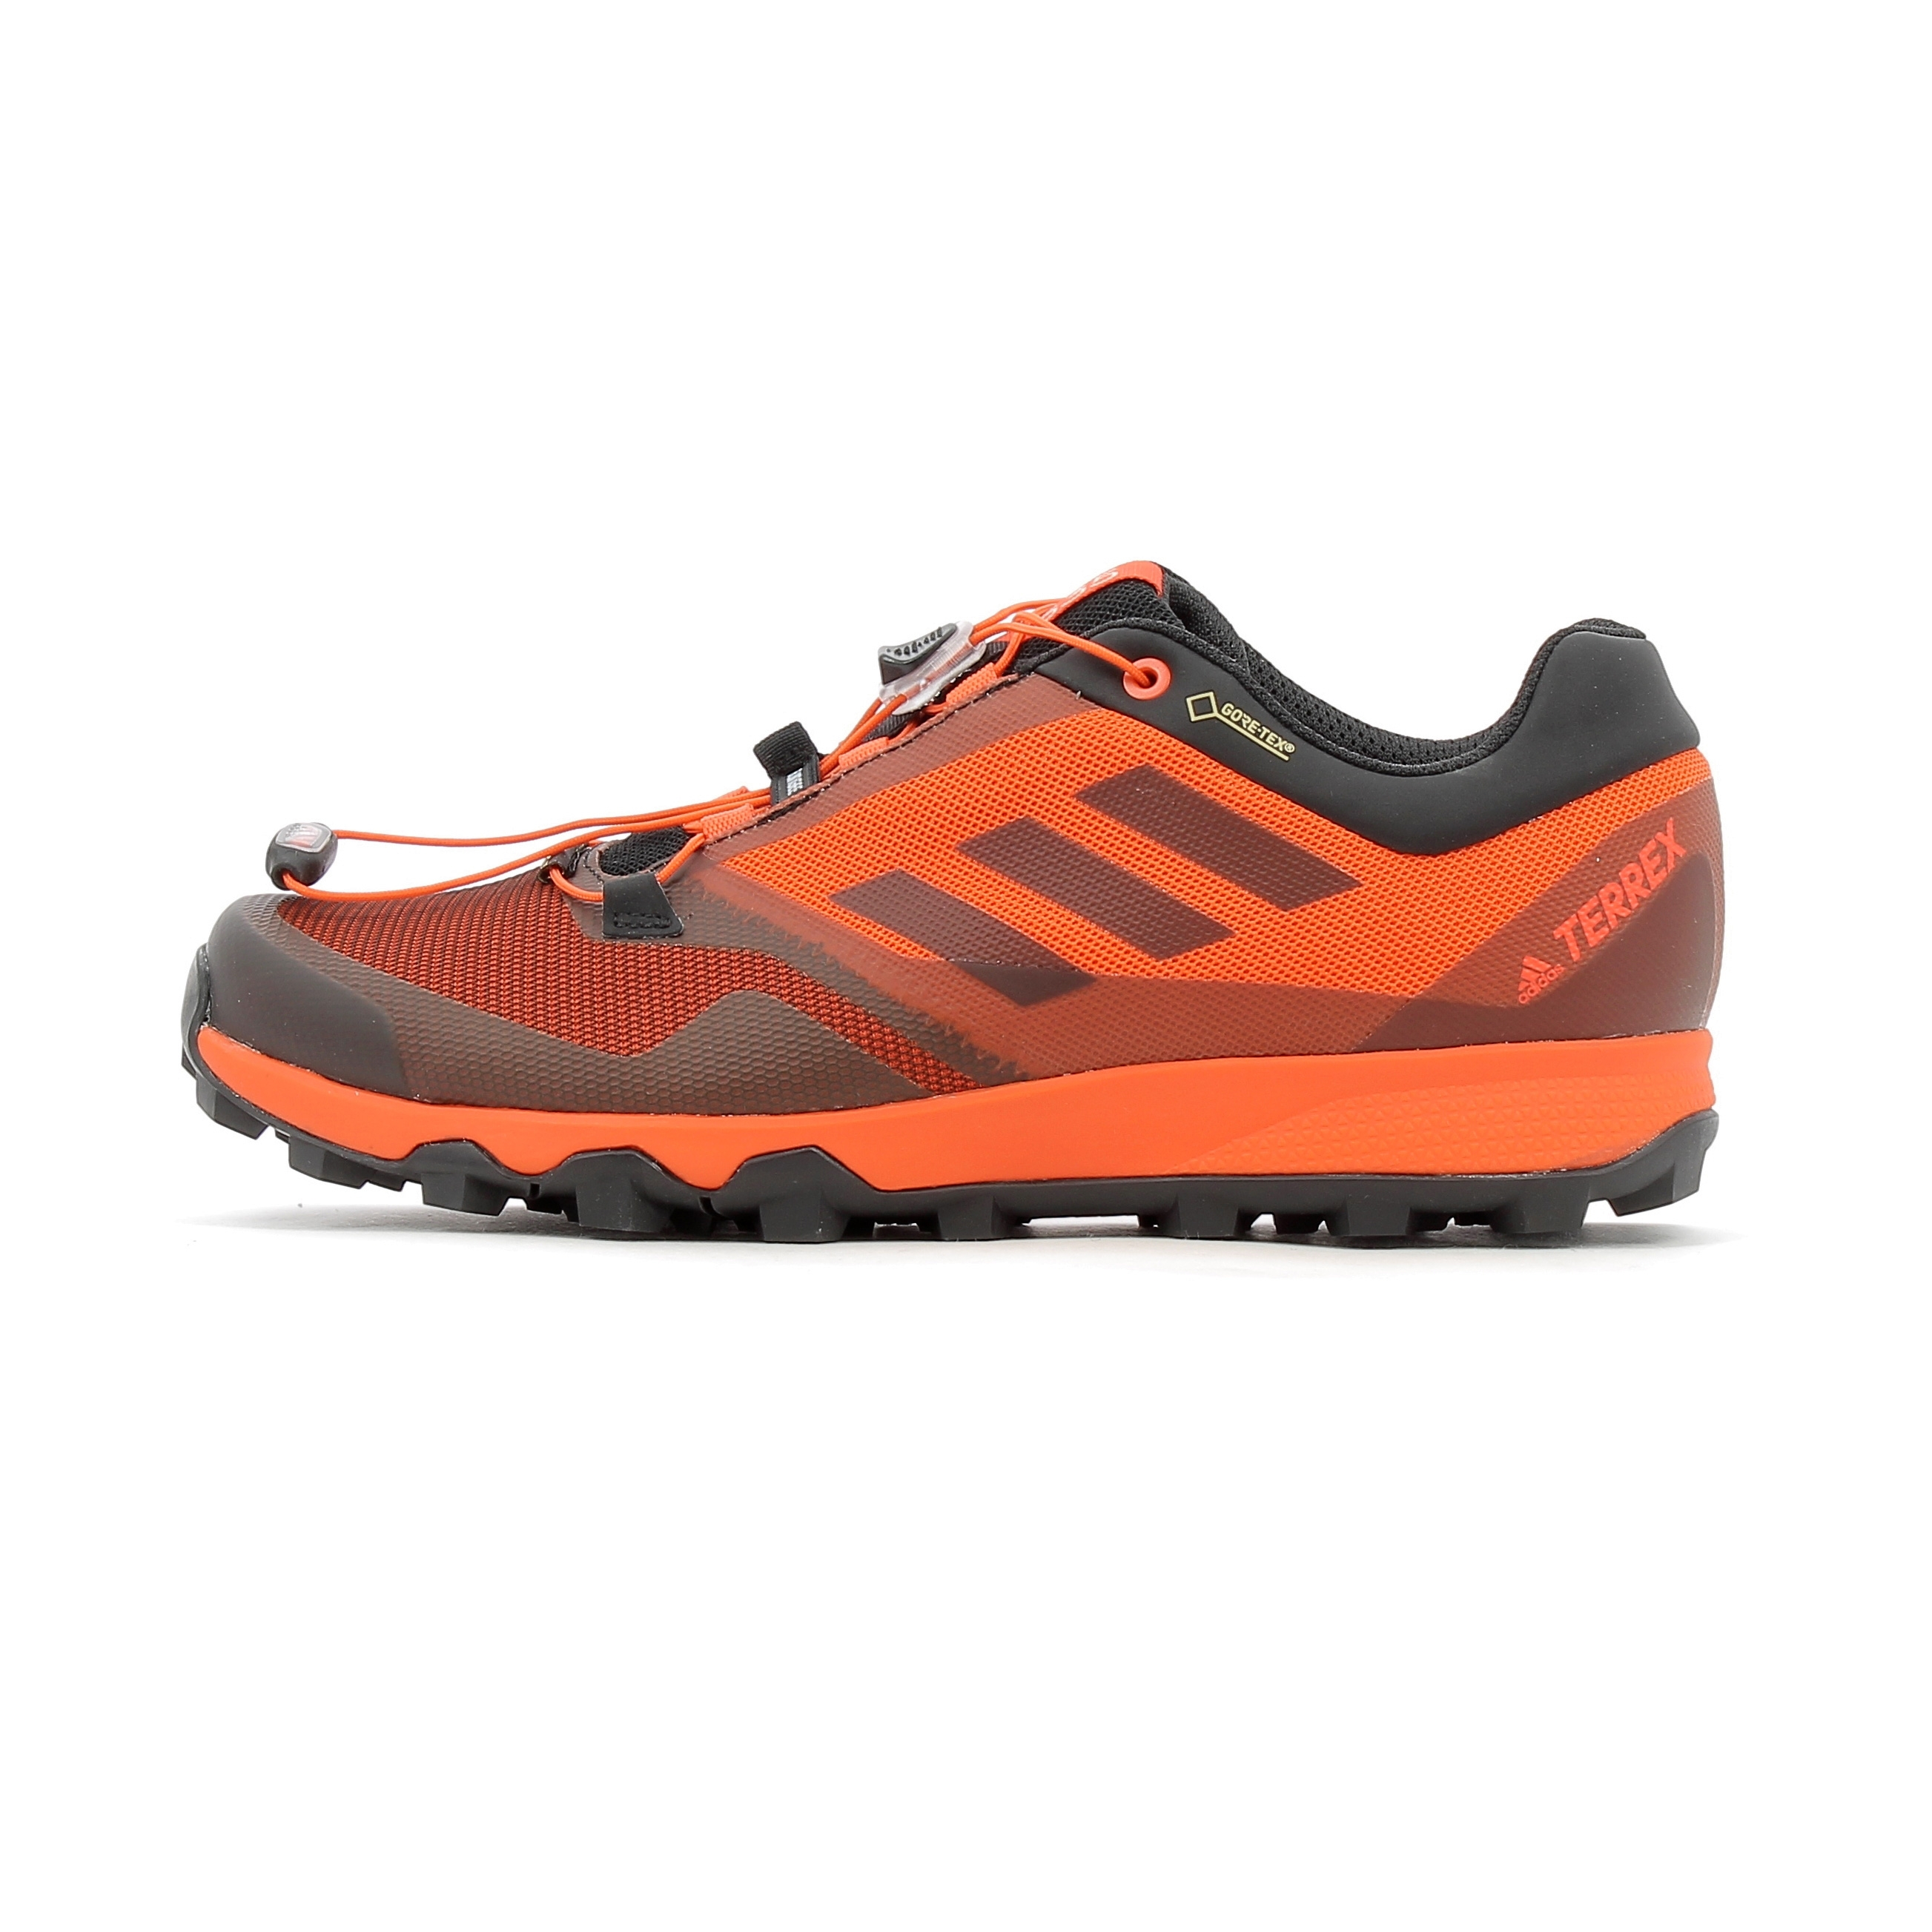 high fashion innovative design beauty chaussures de trail Adidas Performance Terrex Trailmaker GTX